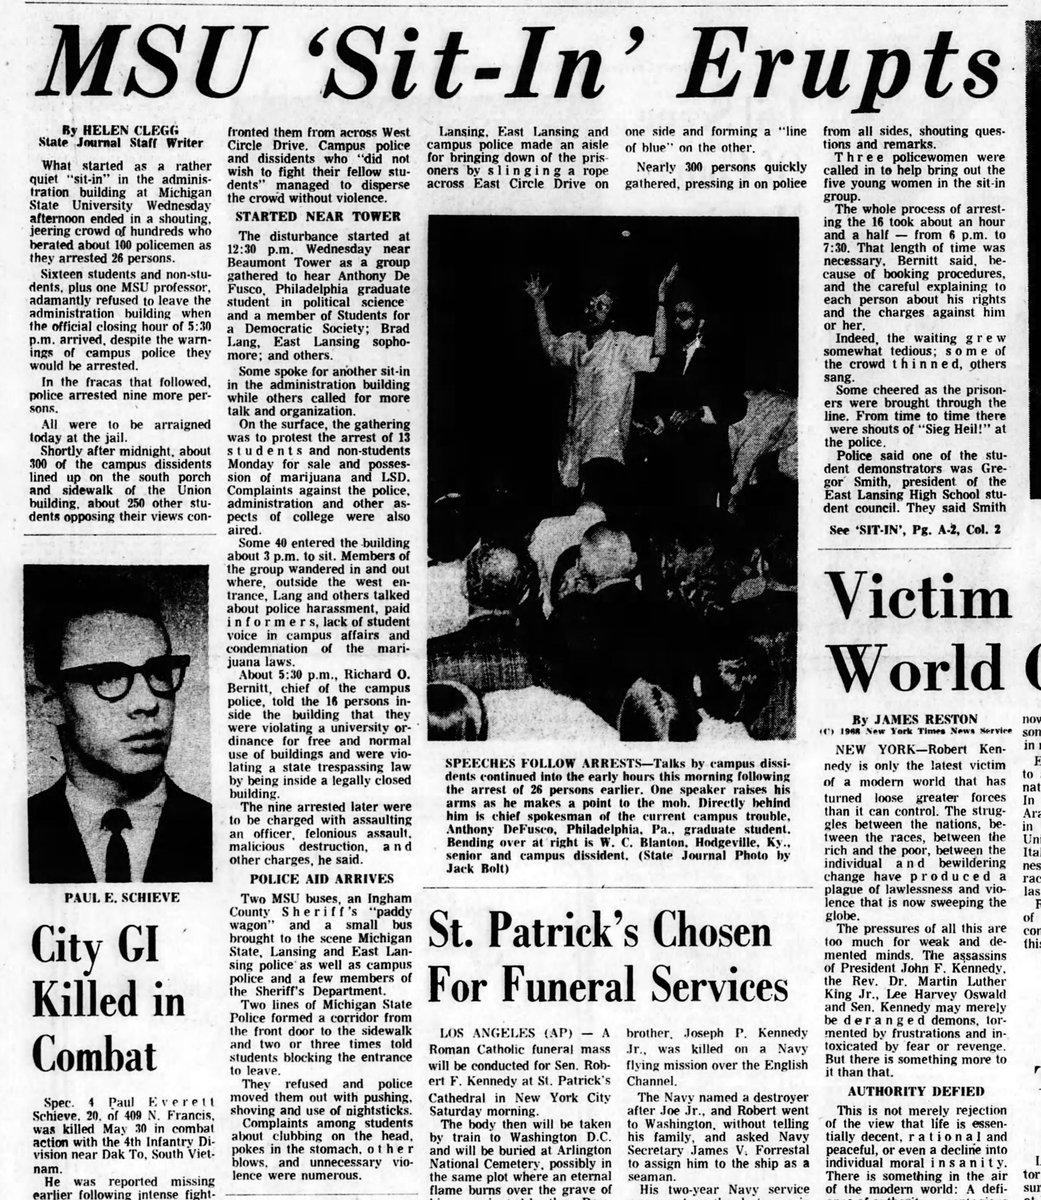 1968 : Campus Sit-In Protests Marijuana and LSD Arrests